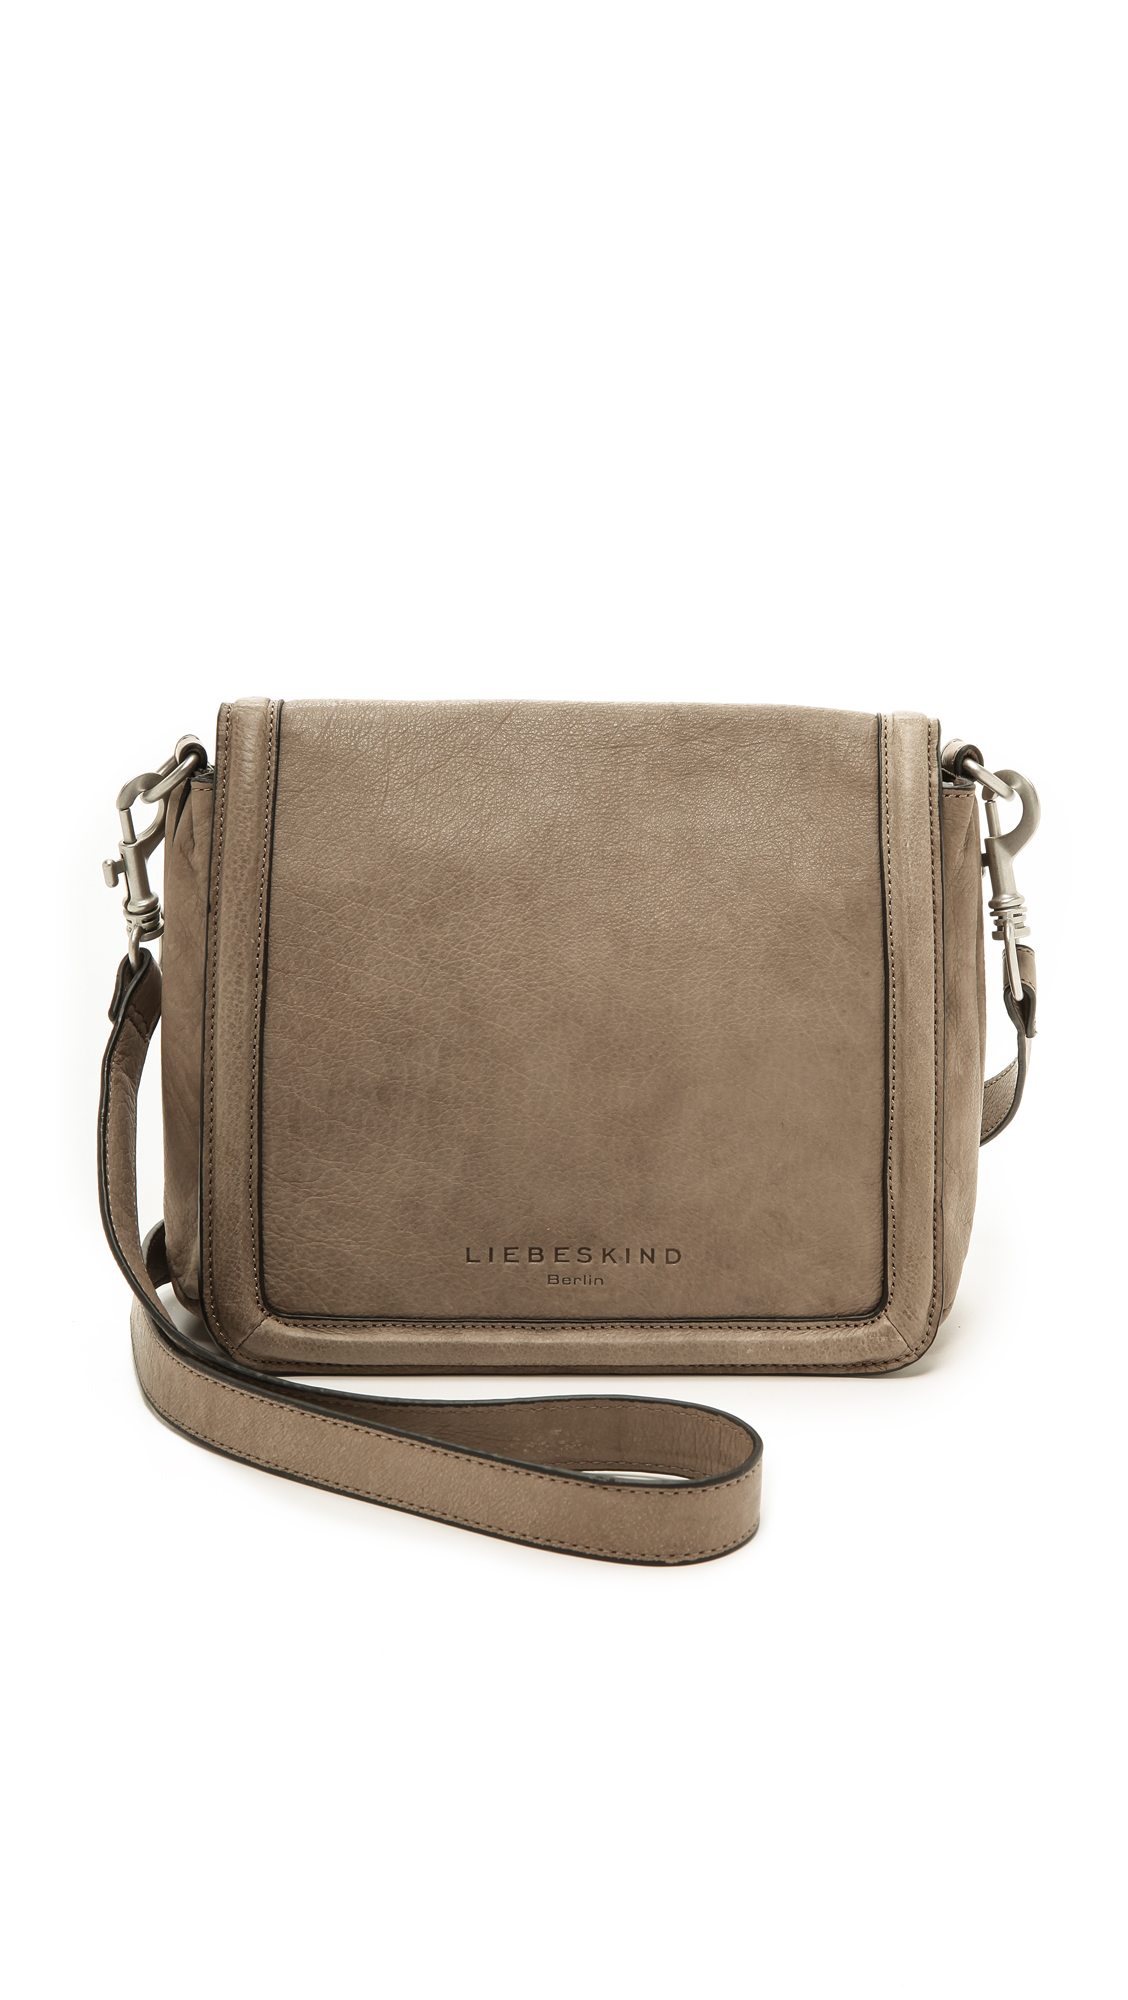 81ec5c6d7 Liebeskind Katelyn Cross Body Bag - French Grey in Natural - Lyst